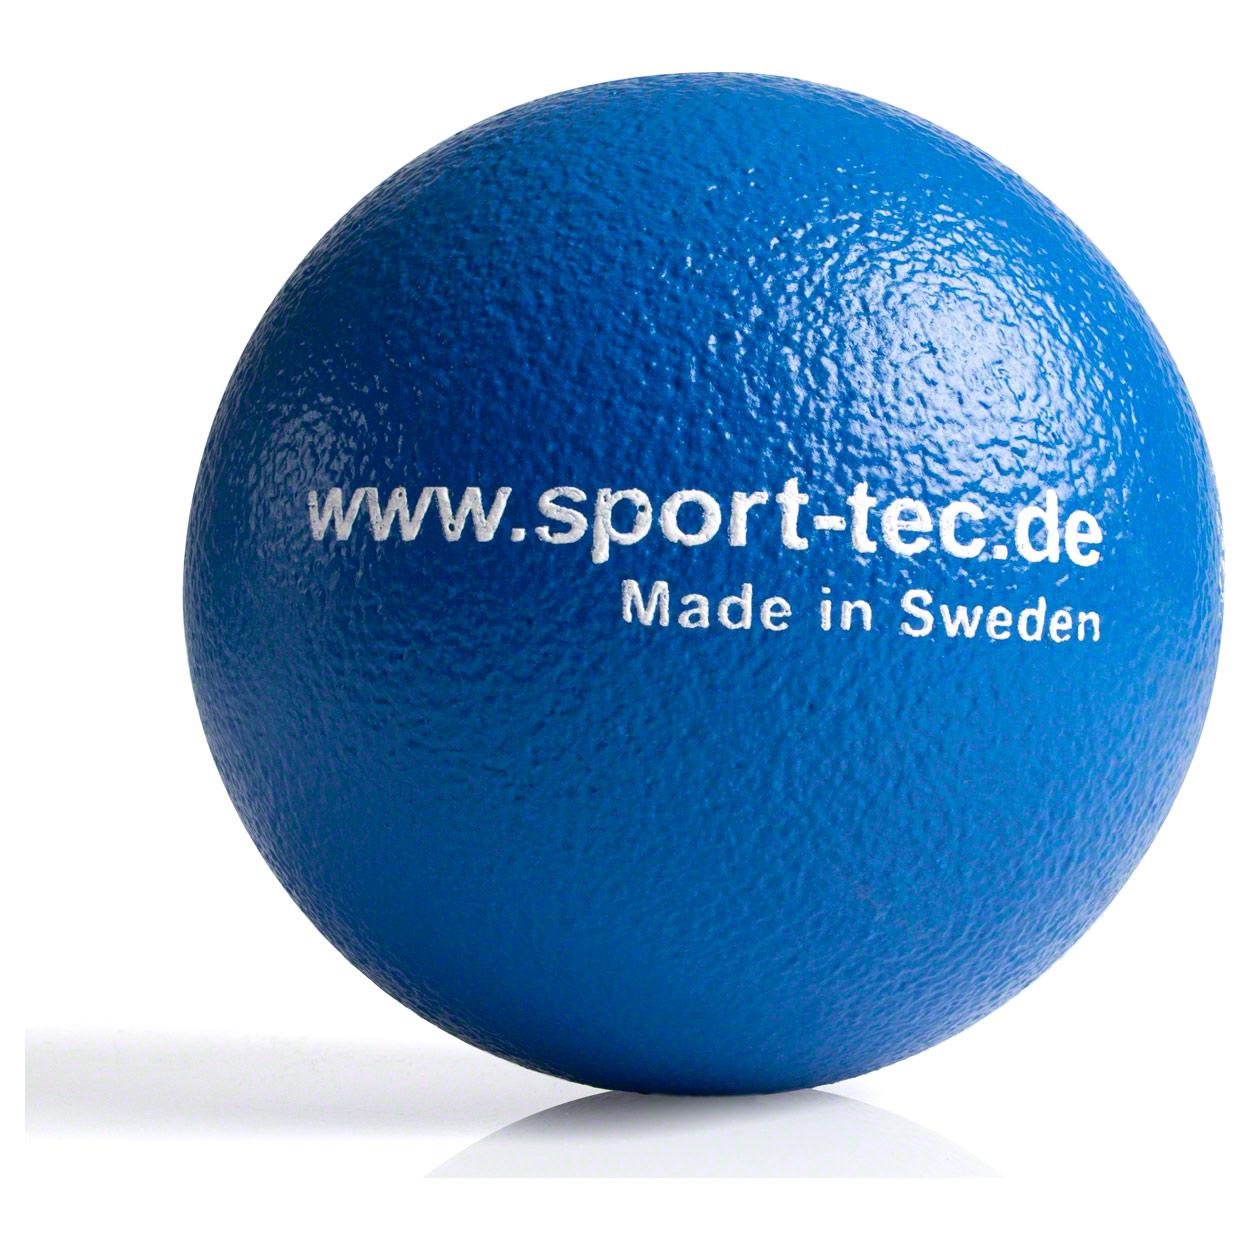 schaumstoffball softball spielball aus schaumstoff beschichtet ebay. Black Bedroom Furniture Sets. Home Design Ideas